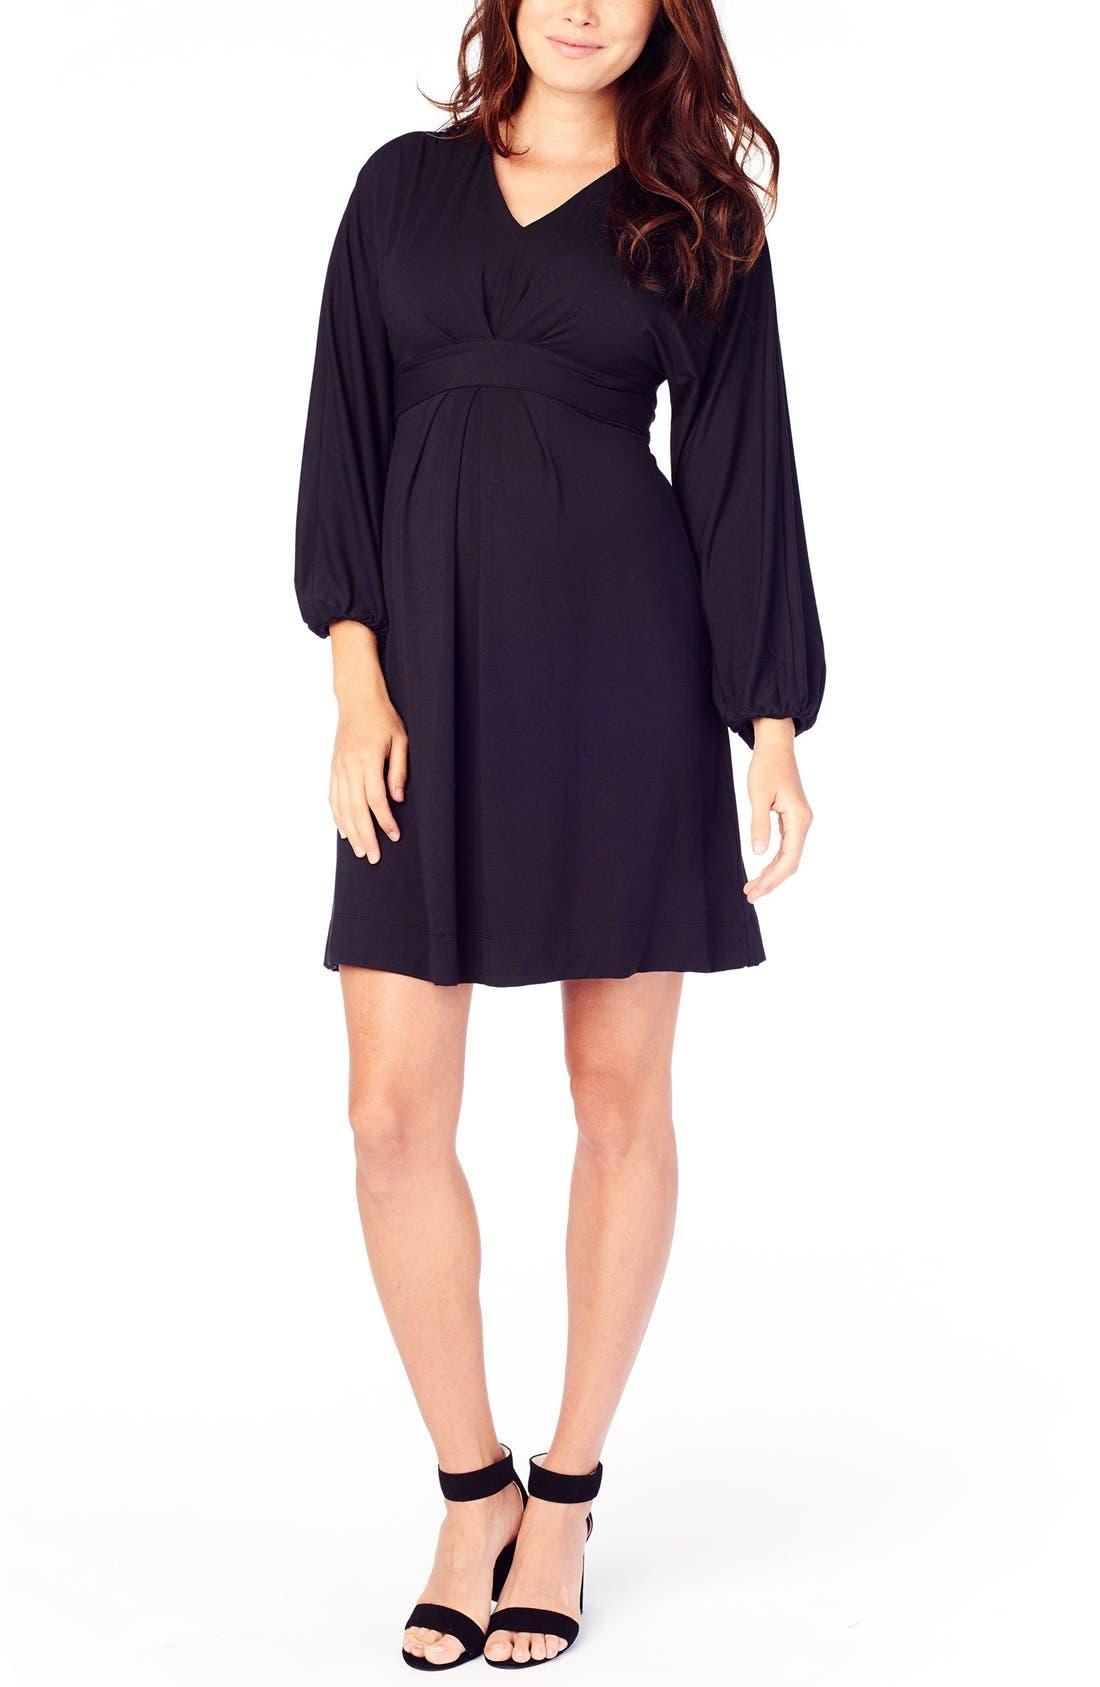 Alternate Image 1 Selected - Ingrid & Isabel Jersey Maternity Dress